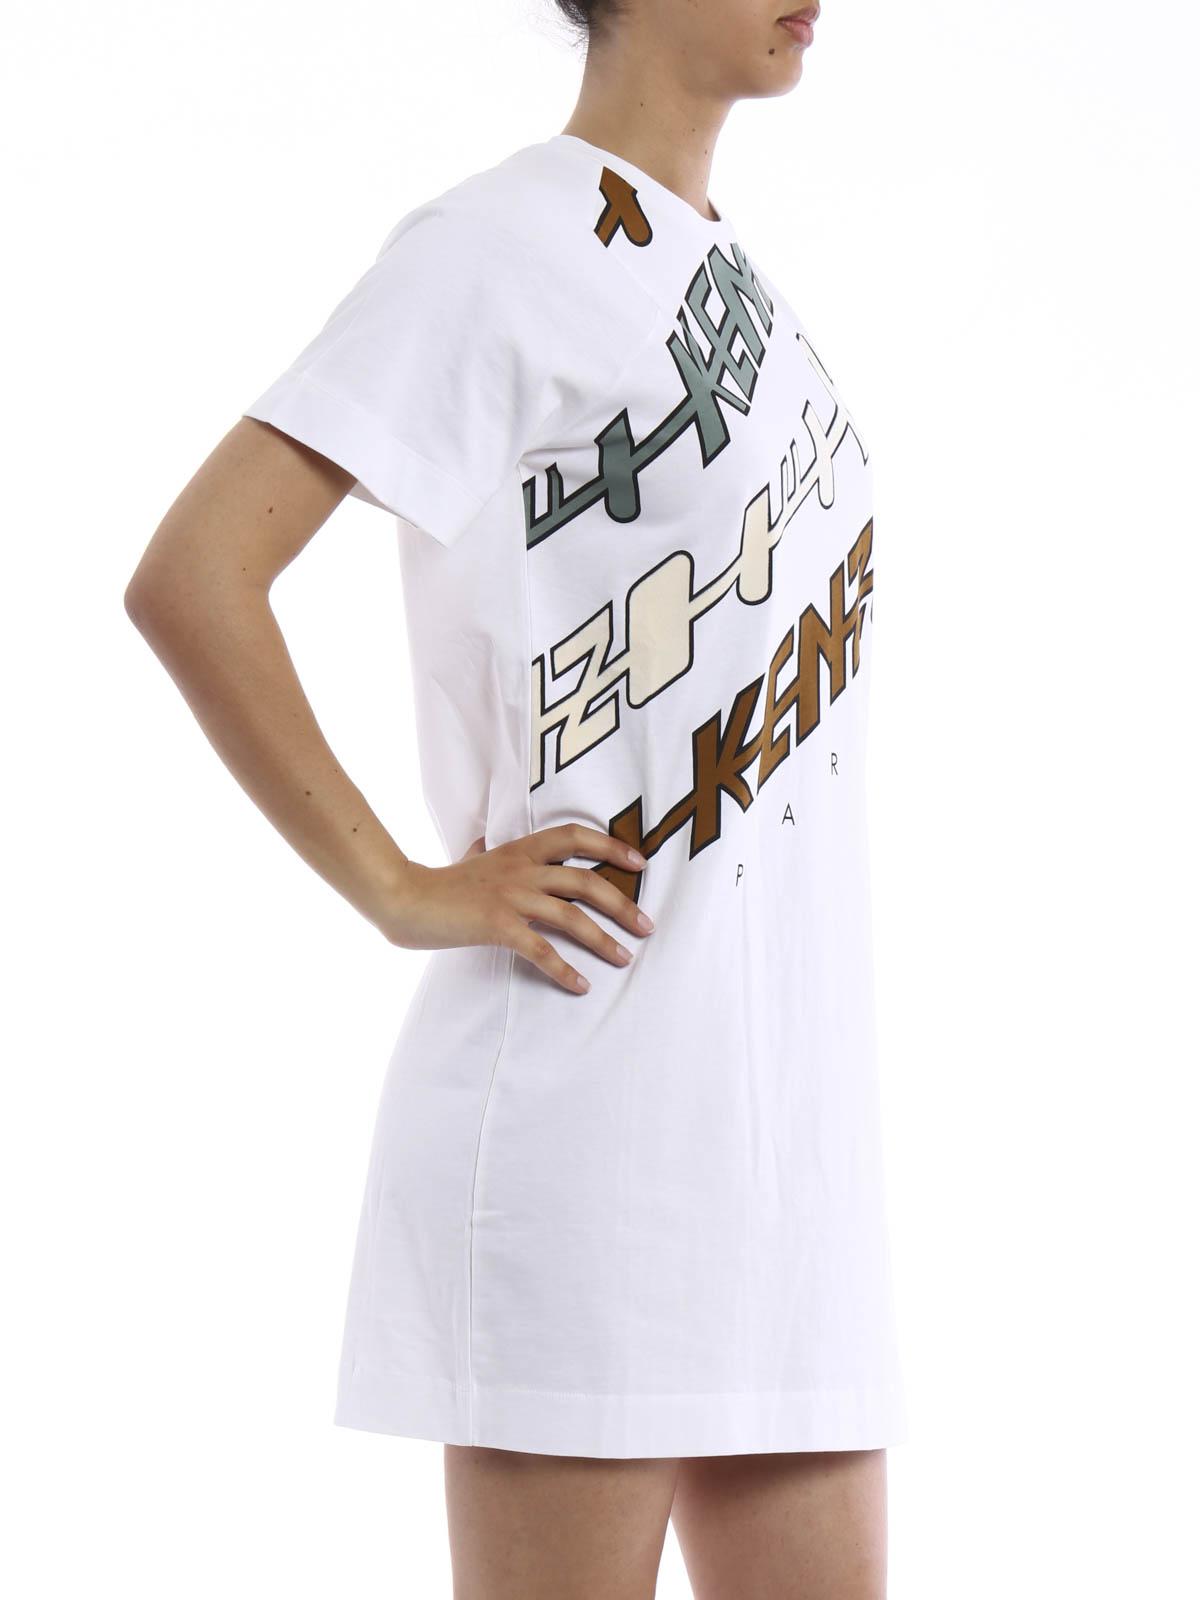 Cotton T-shirt dress by Kenzo - short dresses | iKRIX